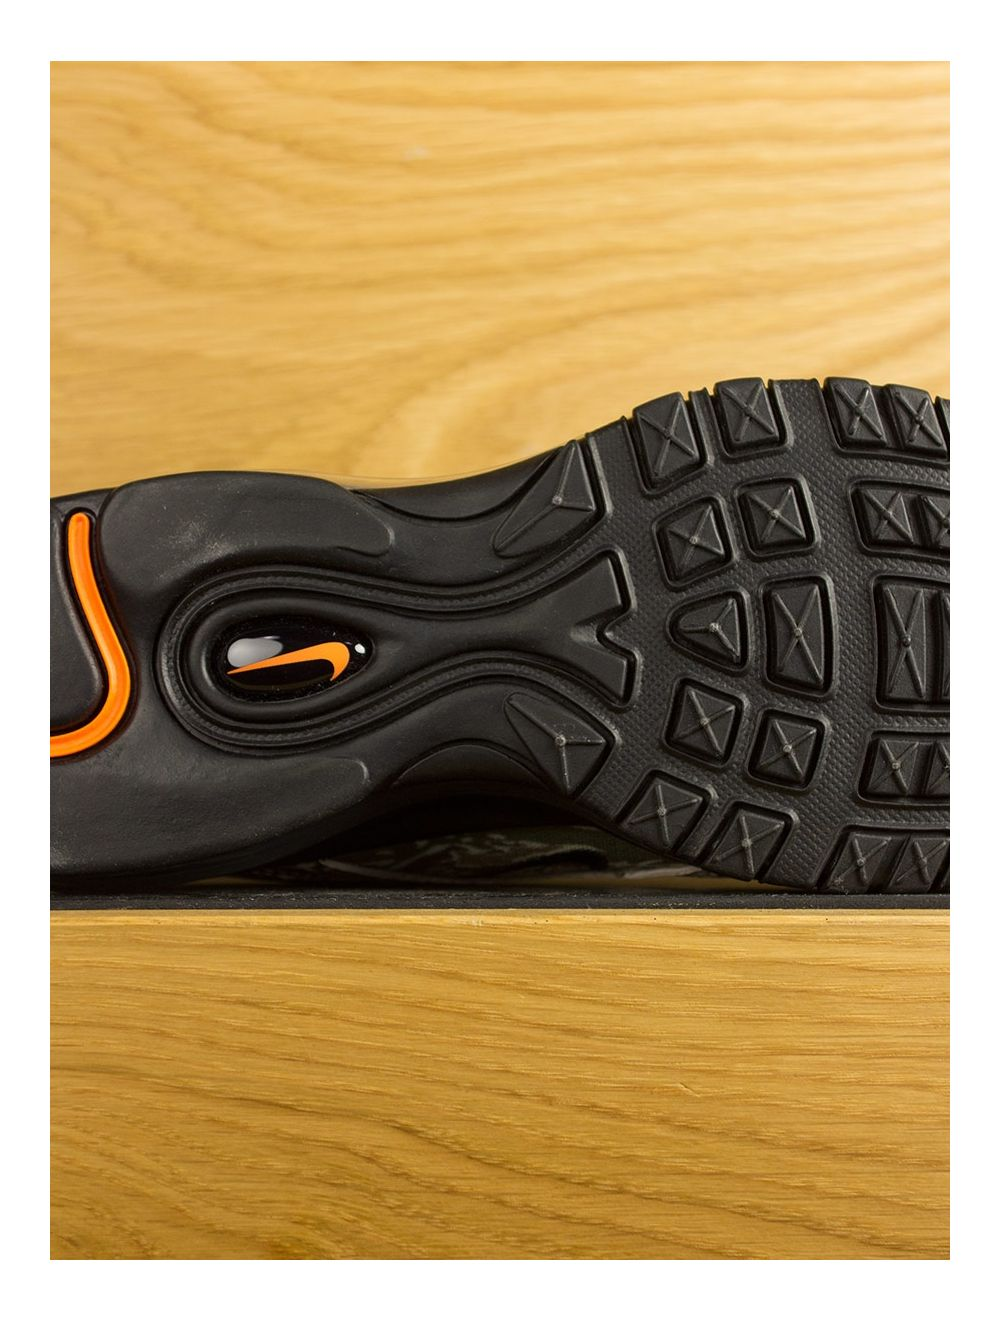 size 40 884d3 c05a9 Nike Air Max 97 Premium QS 'Country Camo USA' - Medium Olive Black Desert  Sand